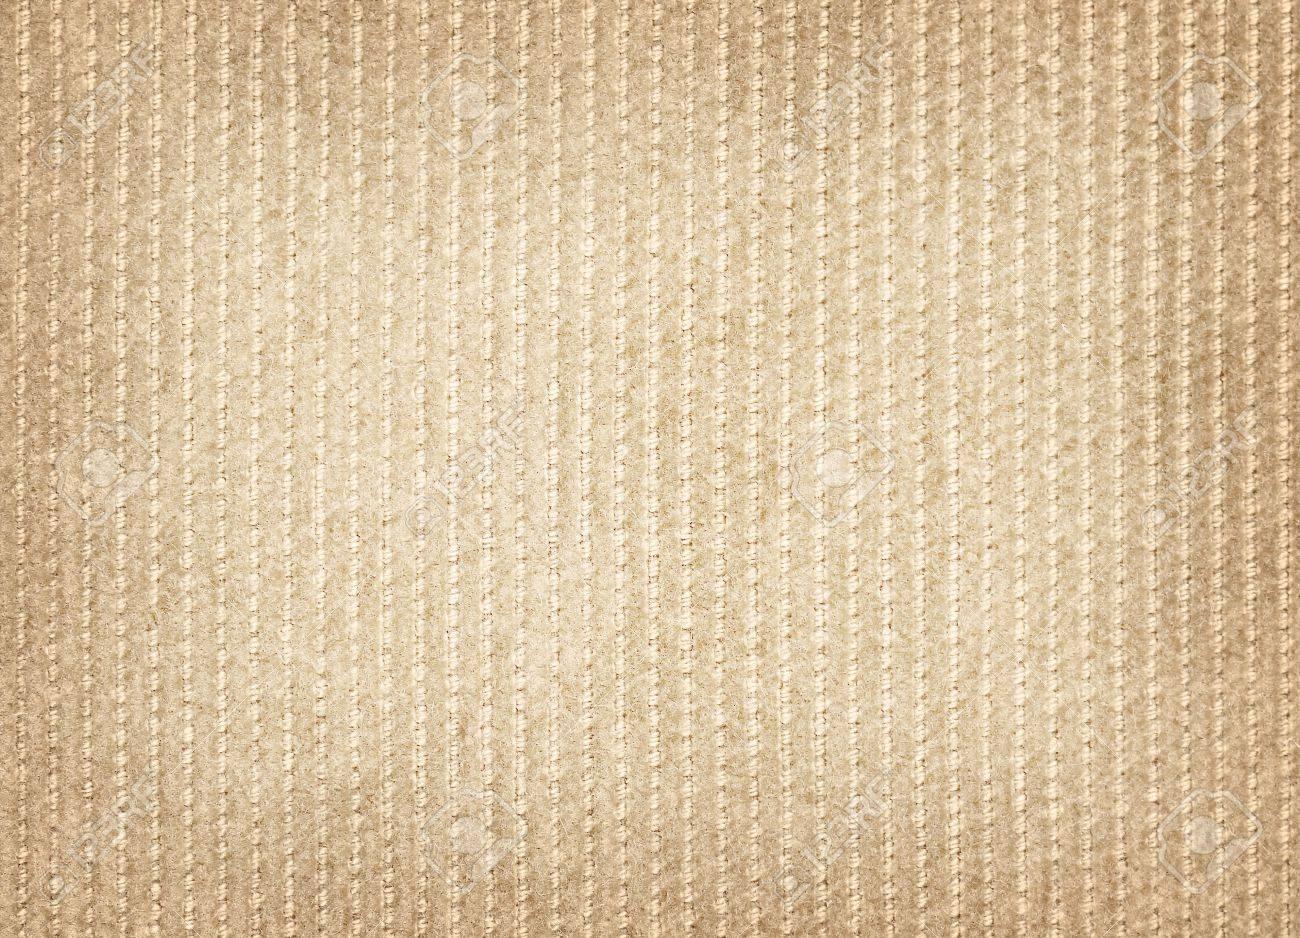 Crushed Velvet Texture Stock Photo